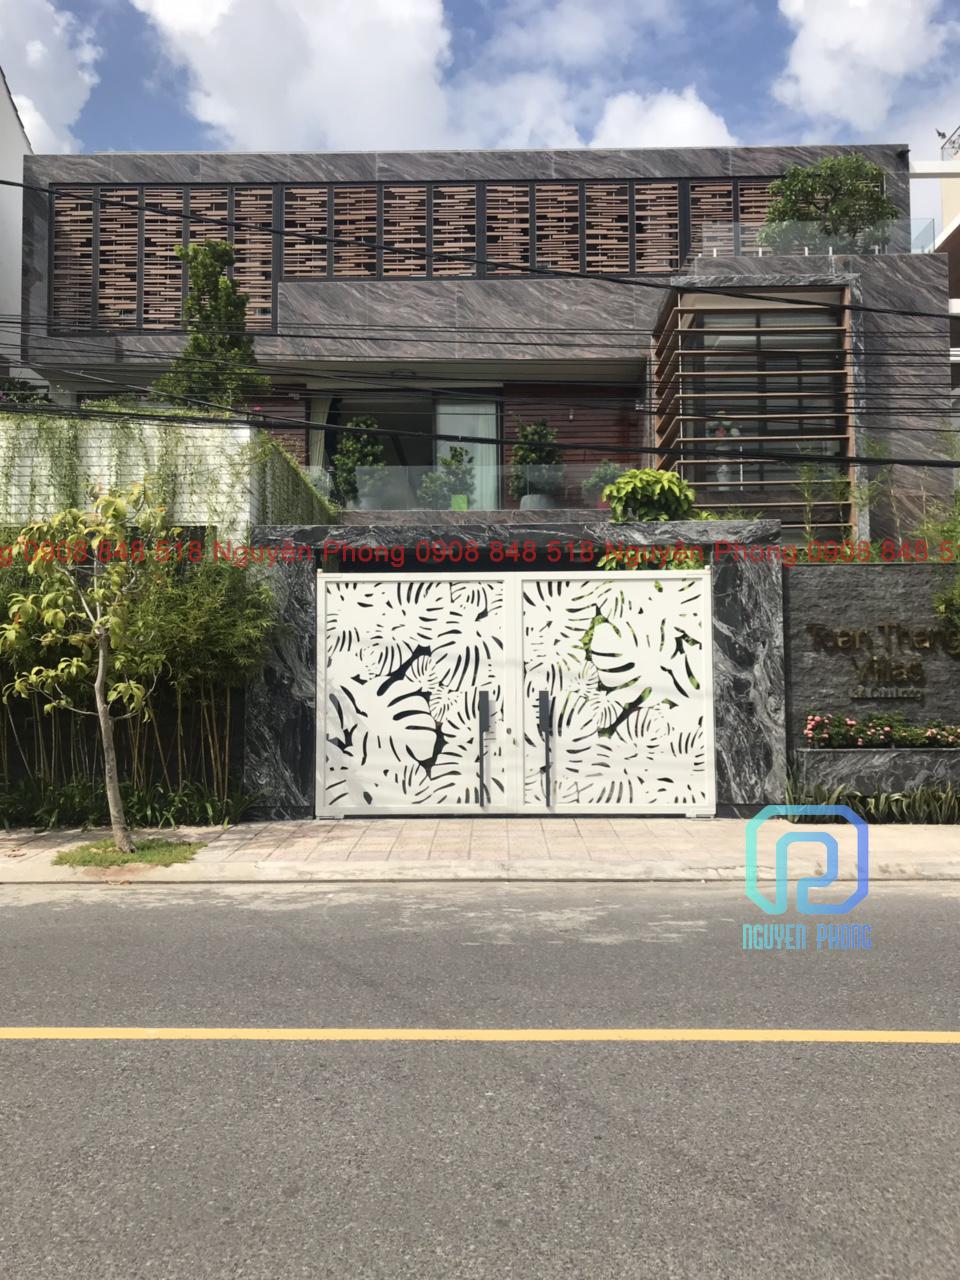 http://nguyenphongcnc.com/assets/images/gallery/cong-cnc-cho-biet-thu-villa-2.jpg